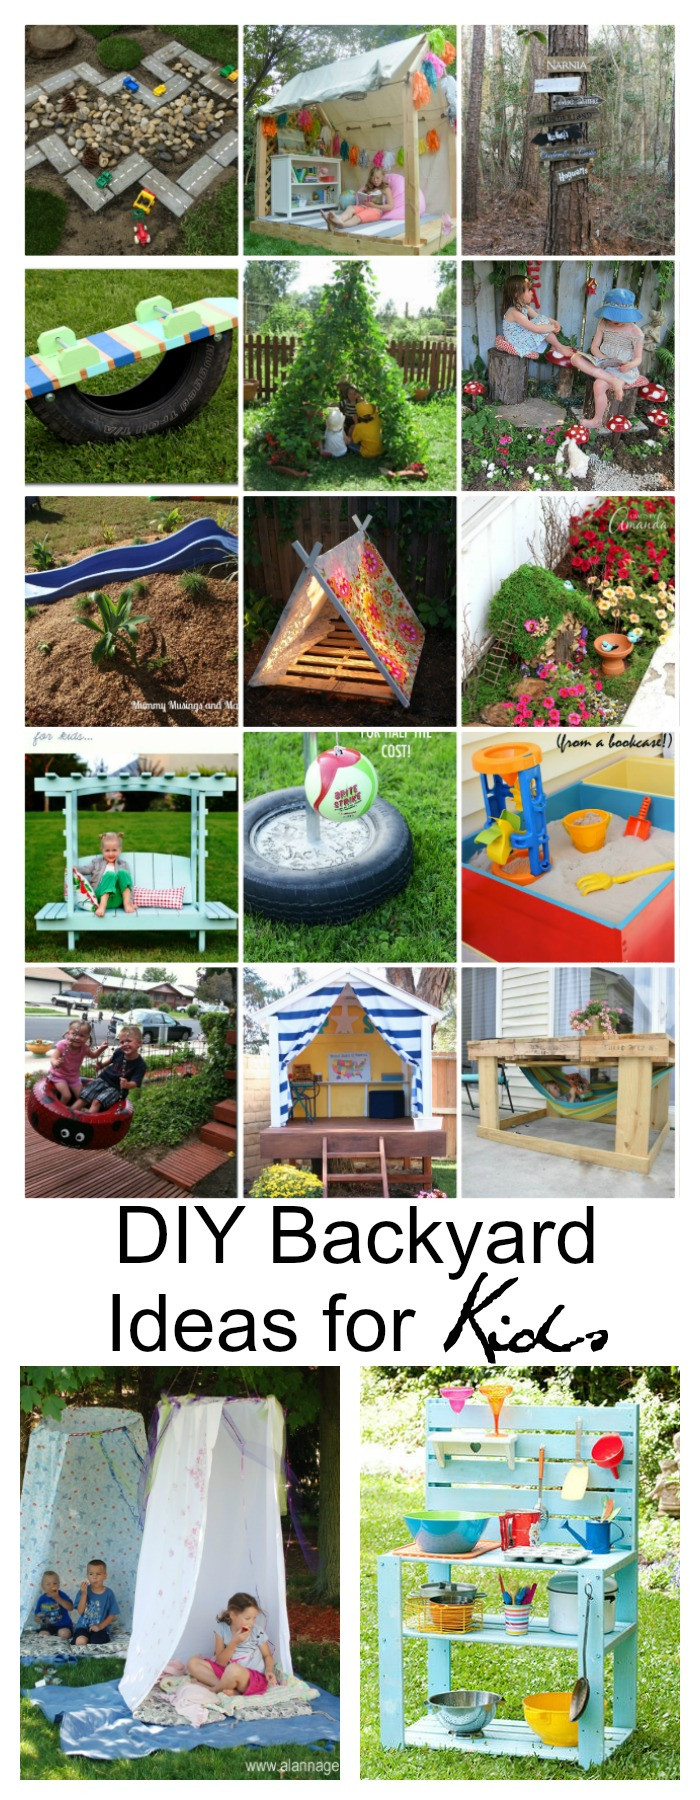 Ideas For Kids  DIY Backyard Ideas for Kids The Idea Room